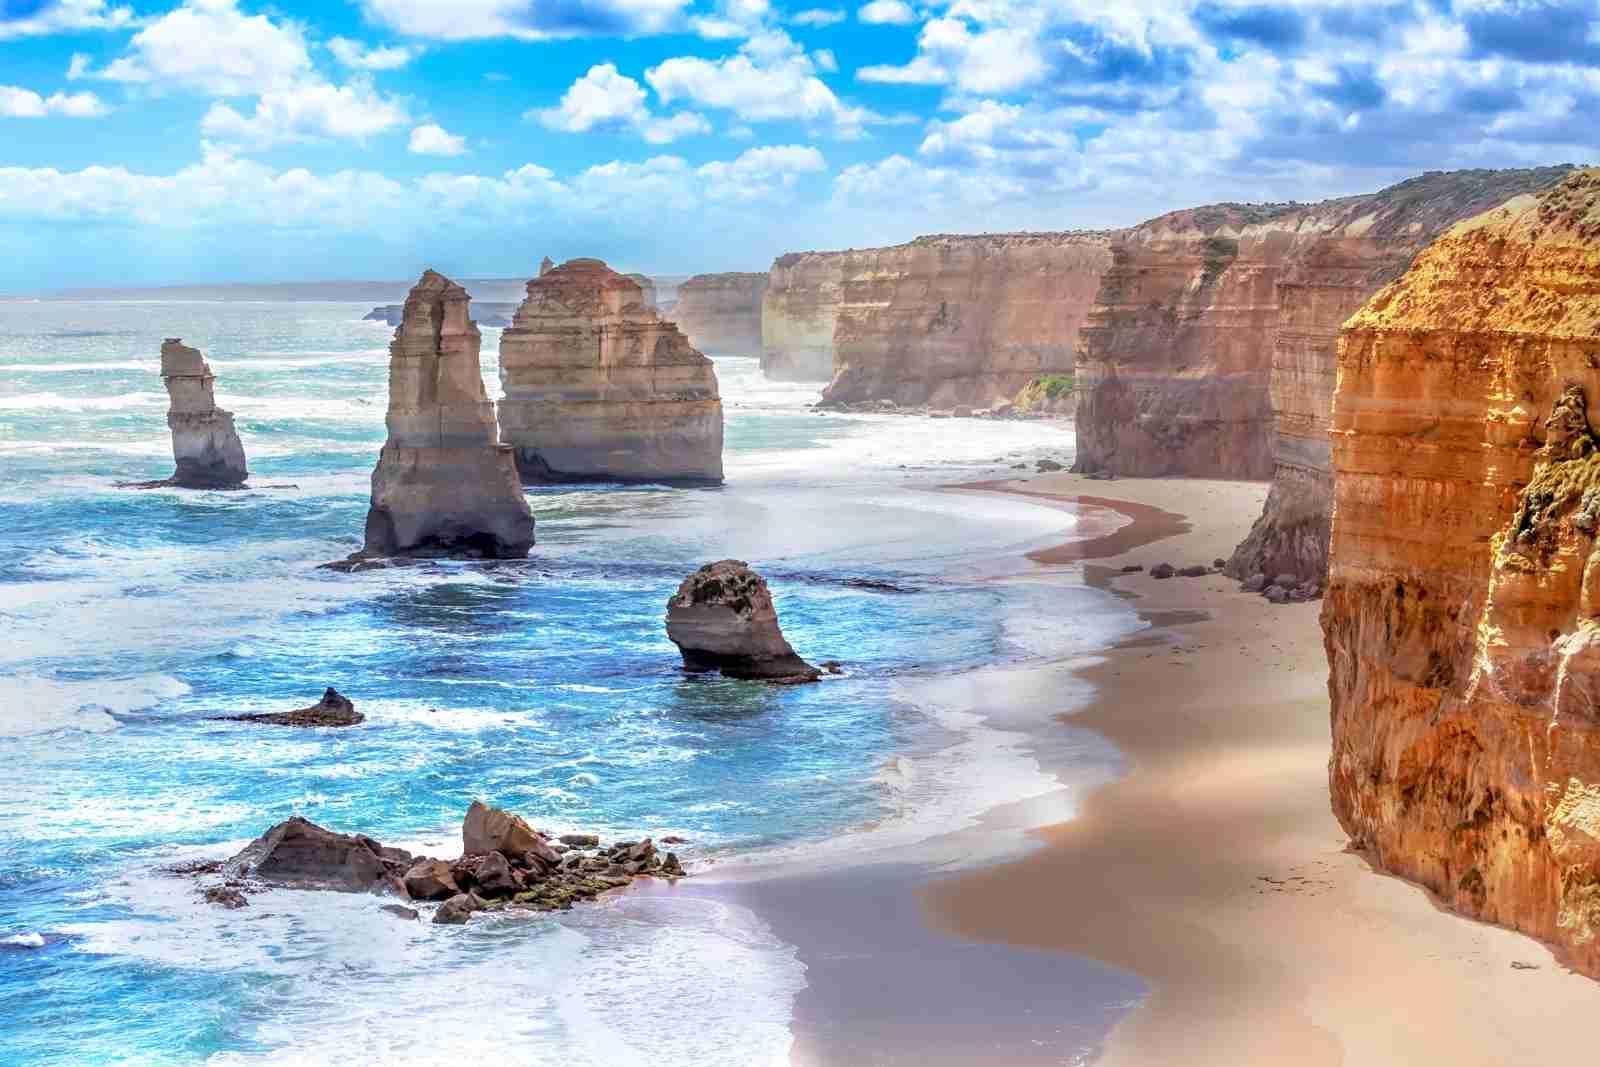 The Twelve Apostles and Orange Cliffs along Australia